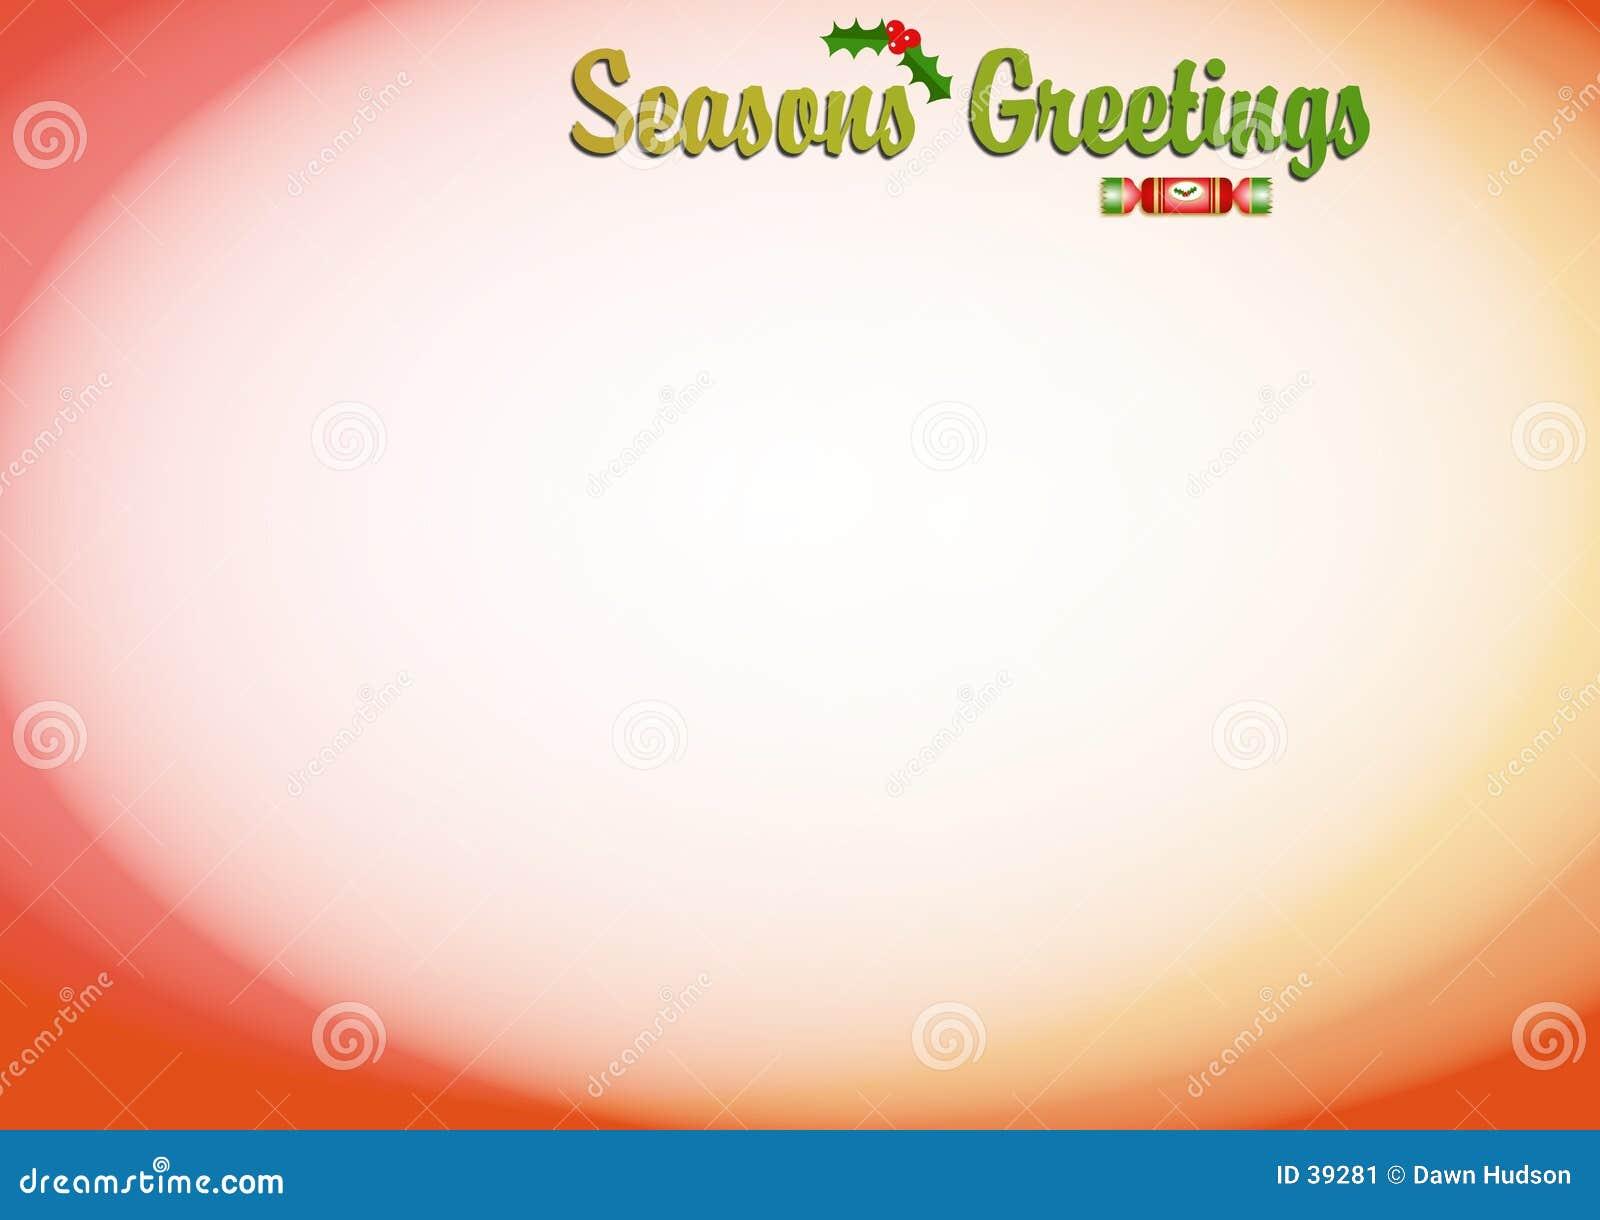 Seasons greetings background stock illustration illustration of seasons greetings background m4hsunfo